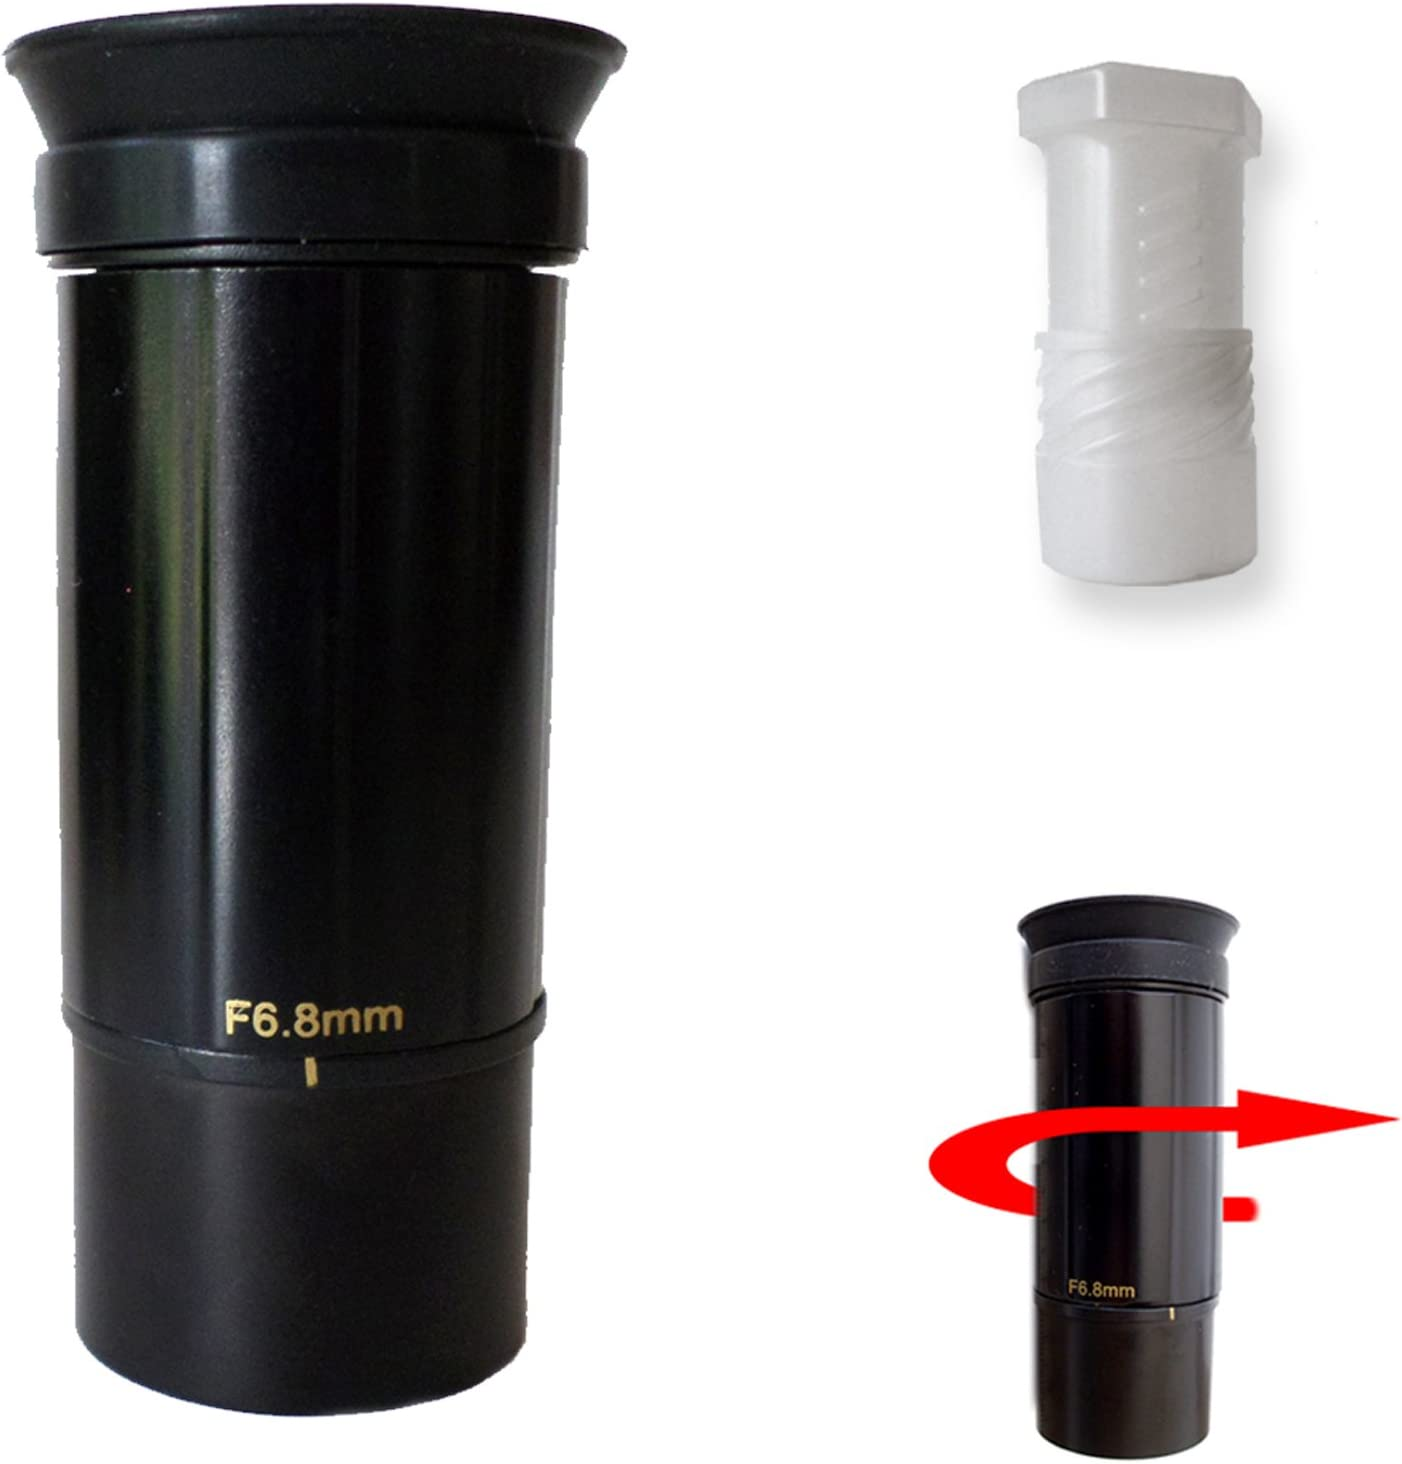 1.25 Format 6.8mm-16mm Zoom Telescope Eyepiece